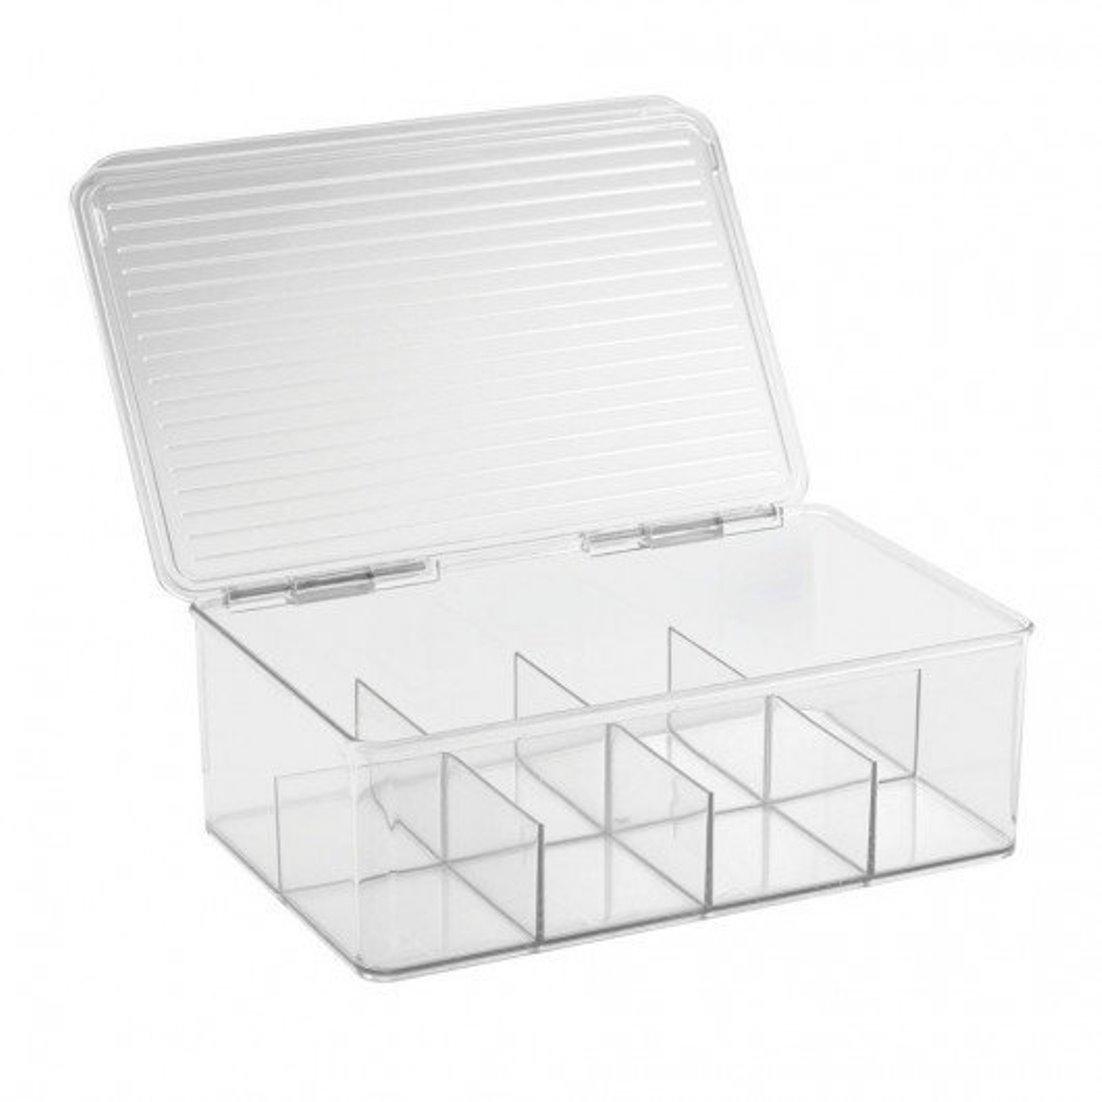 Онлайн каталог PROMENU: Контейнер для хранения чая (8 ячеек) iDesign CABINET/KITCHEN BINZ, 27,3х18,4х9,5 см, BPA-free пластик, прозрачный                               67830EU